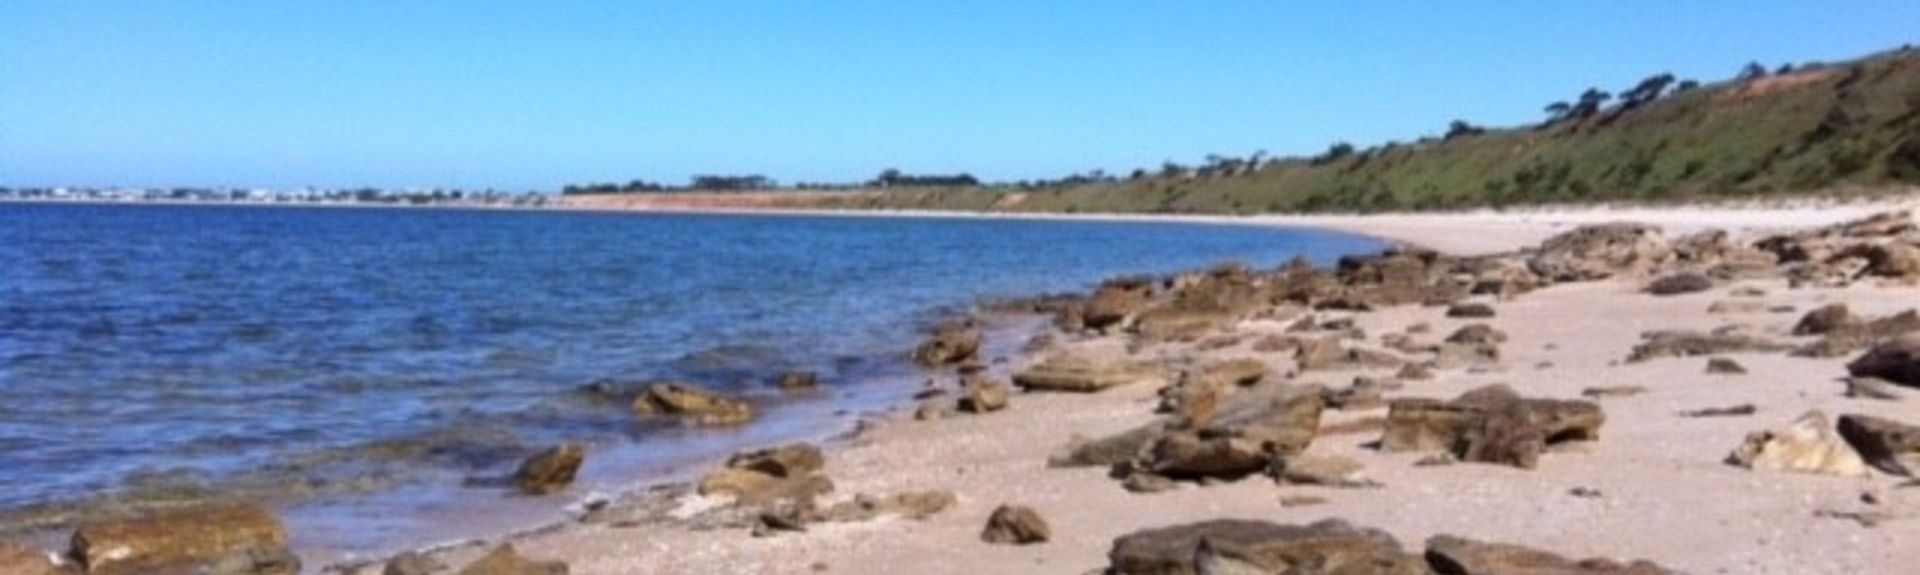 Port Vincent SA, Australia